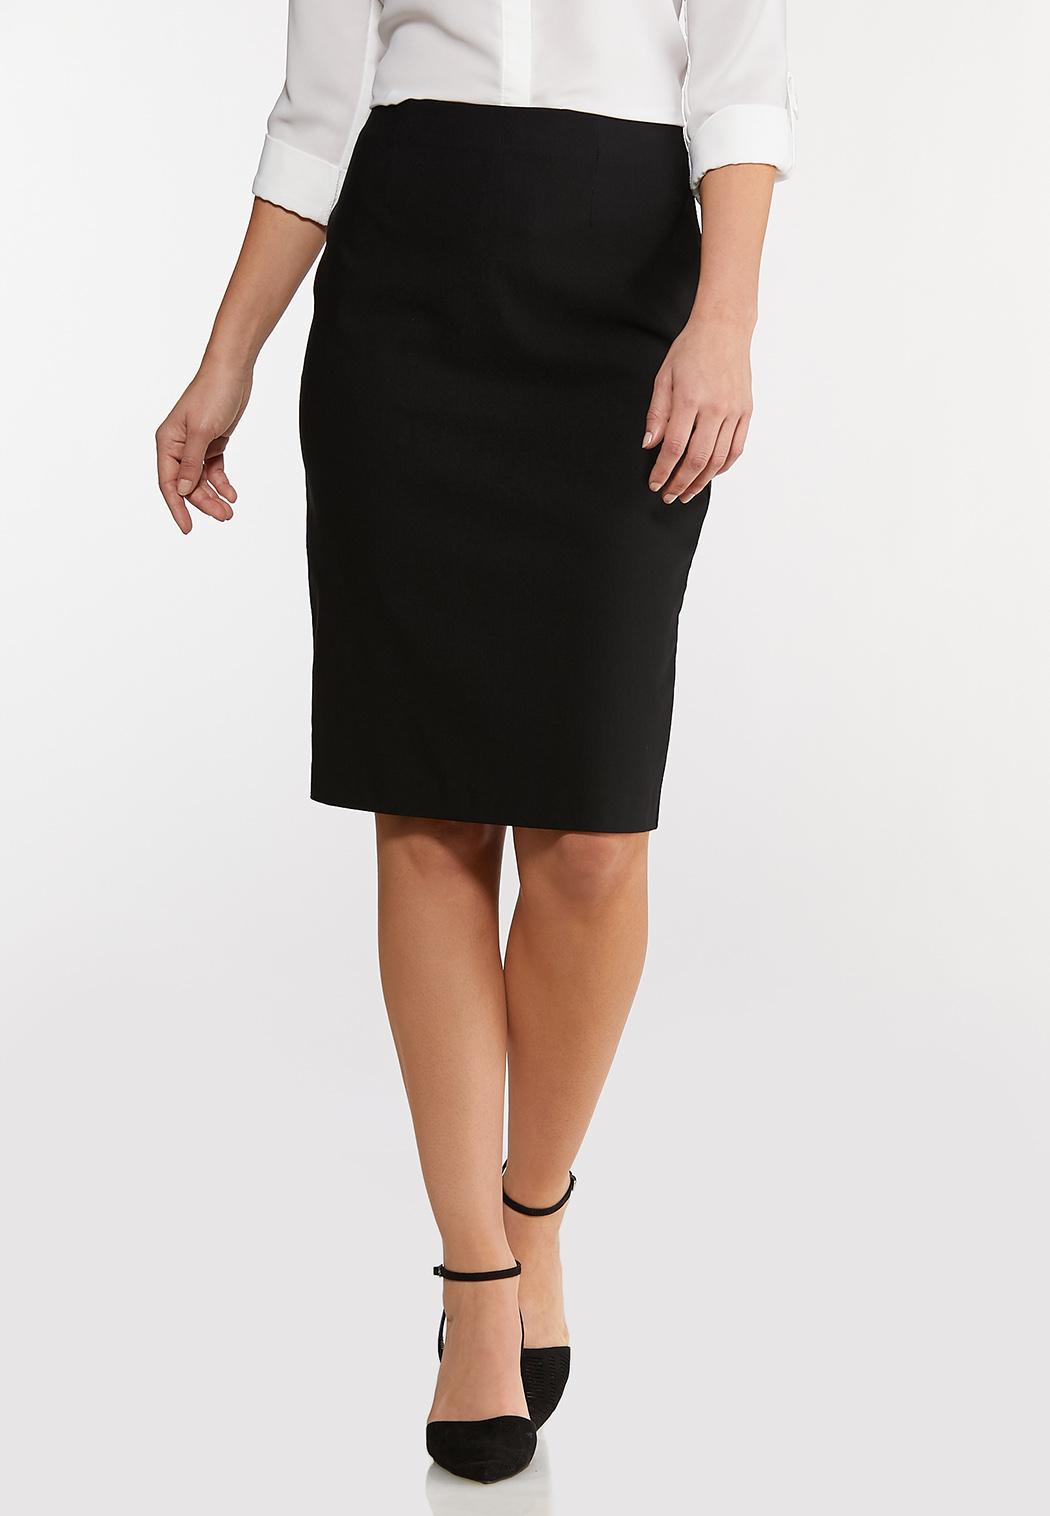 Black Bengaline Pencil Skirt